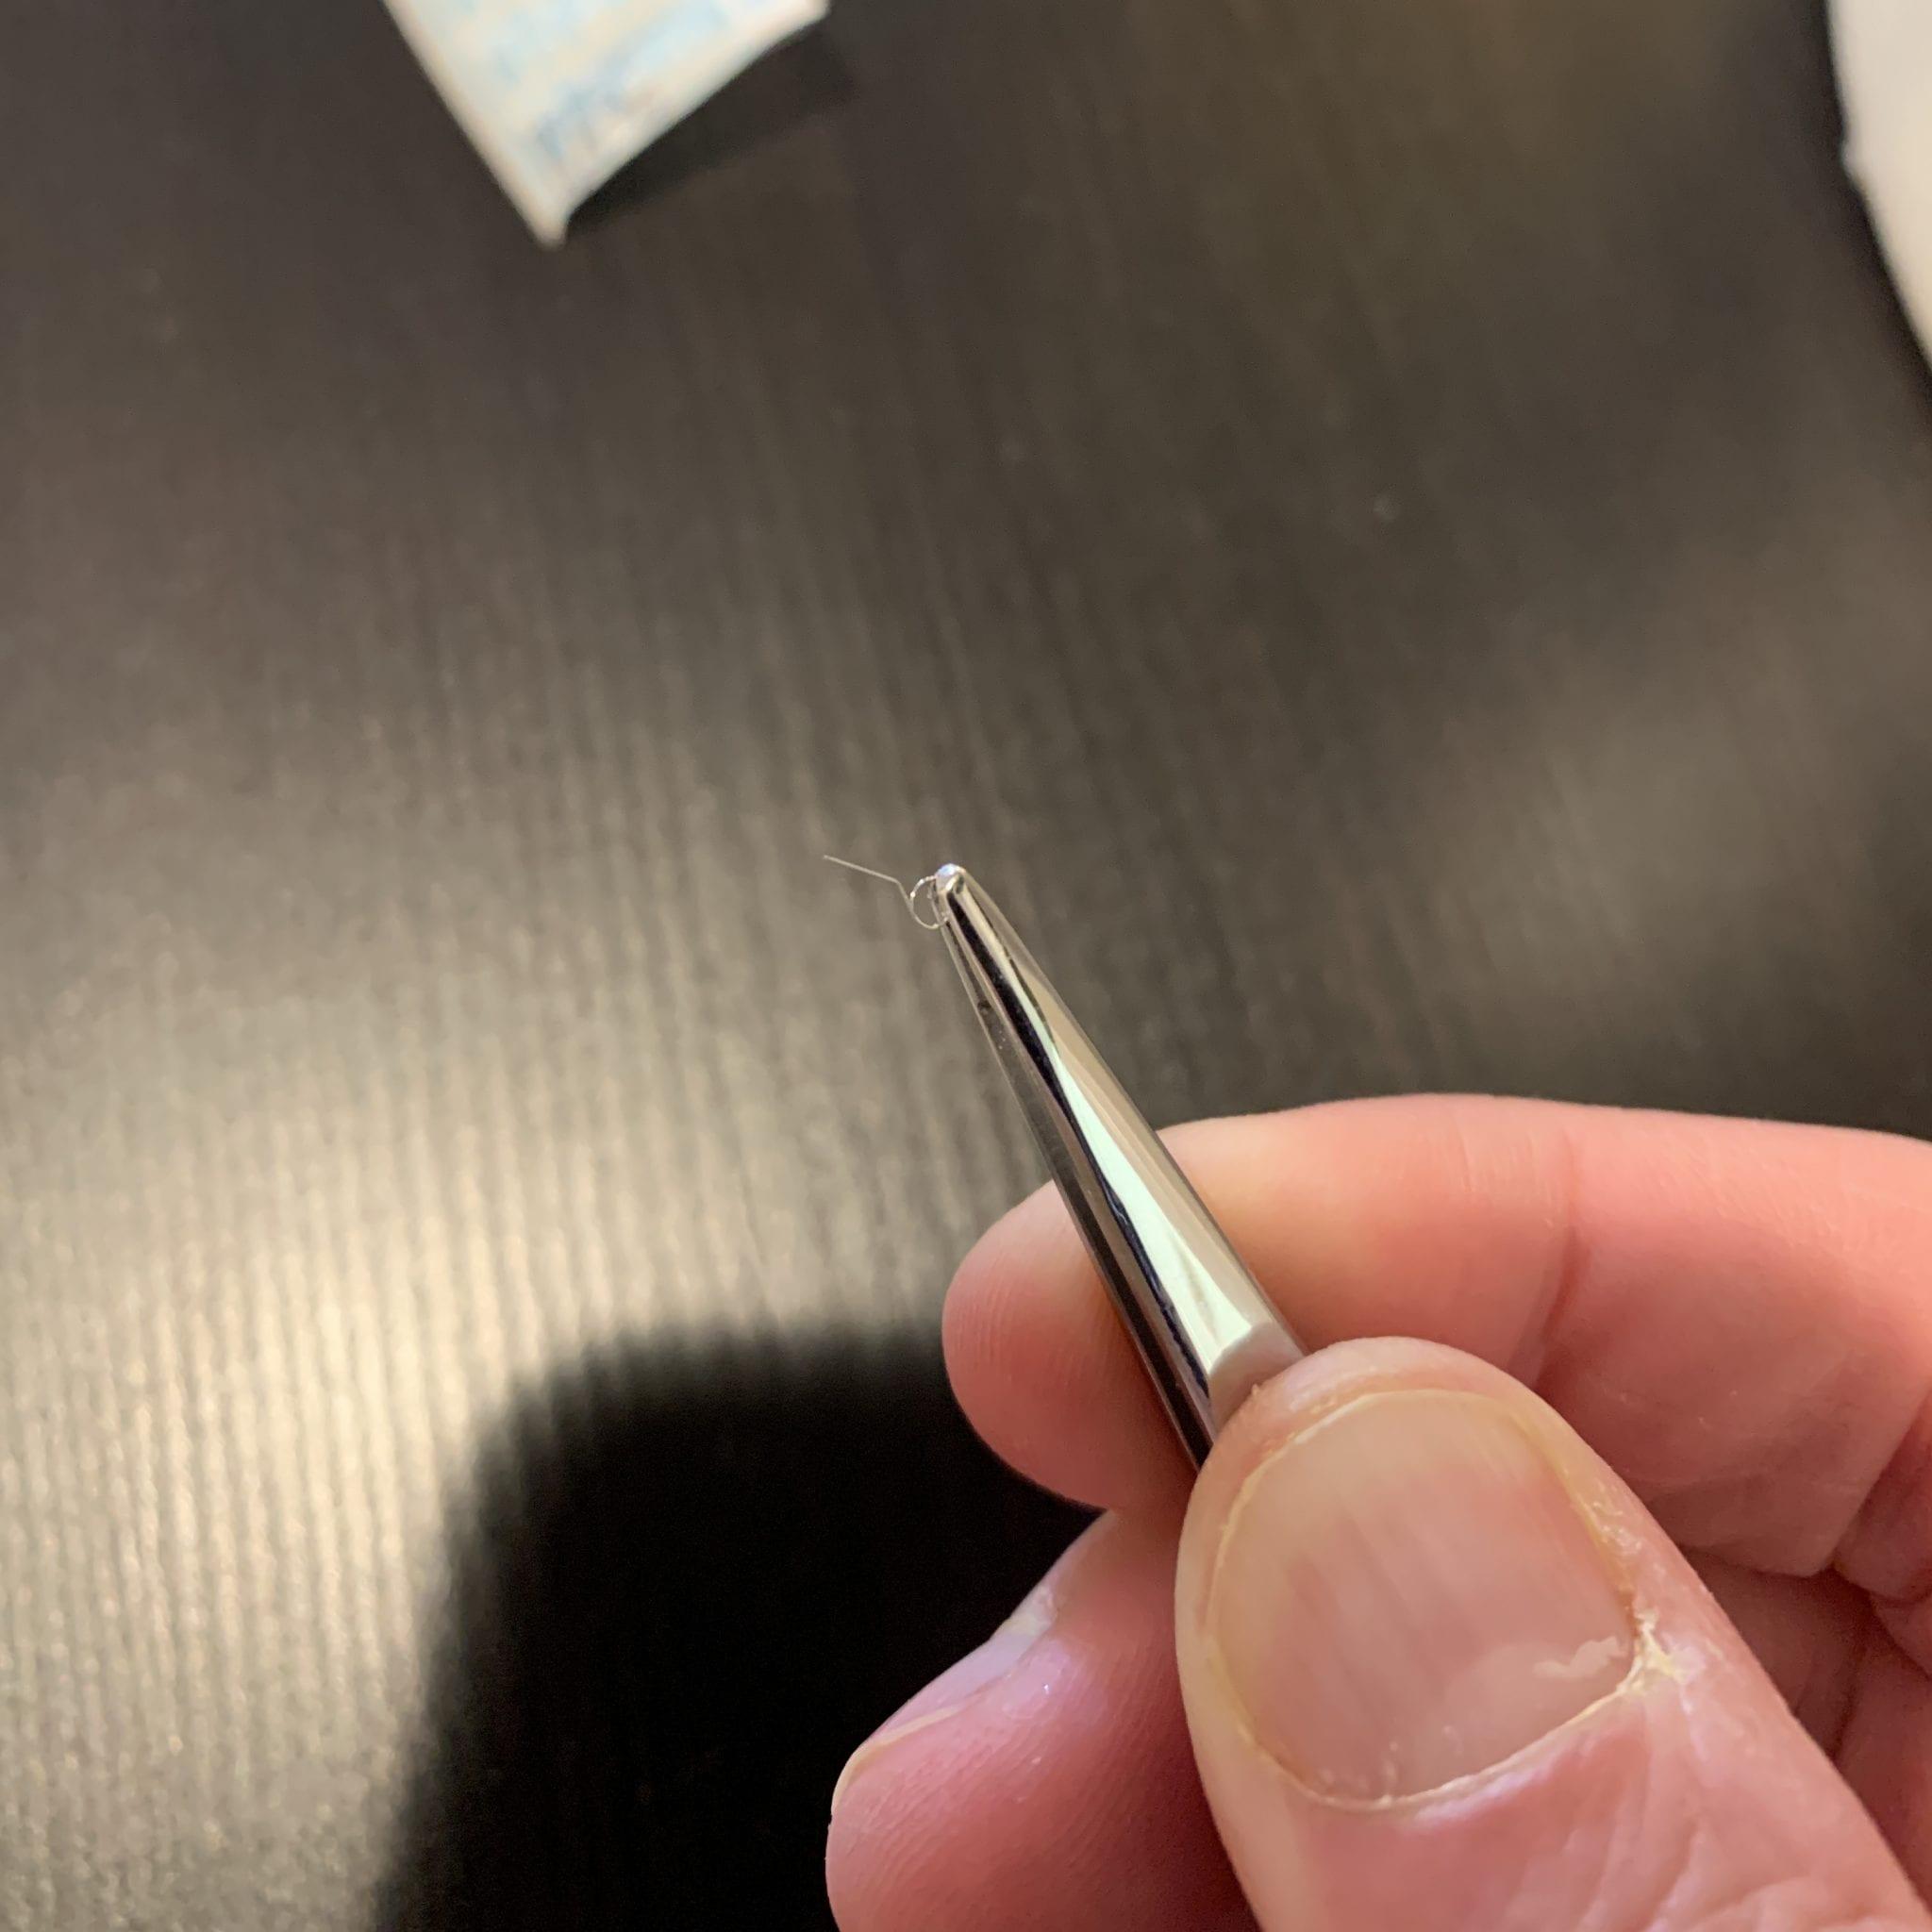 Another Spinex Needle Photo